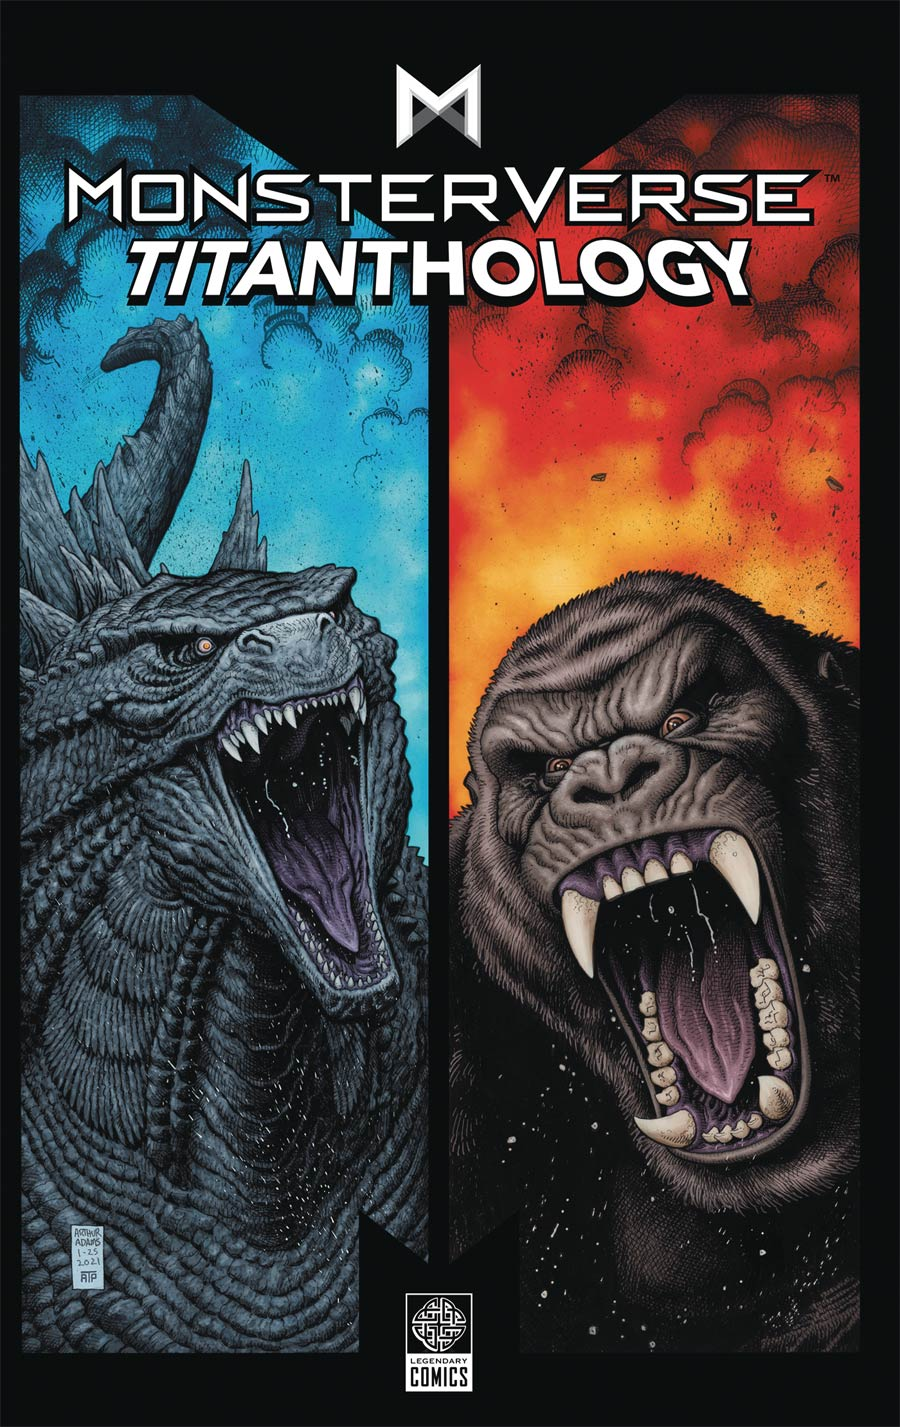 Monsterverse Titanthology Vol 1 TP